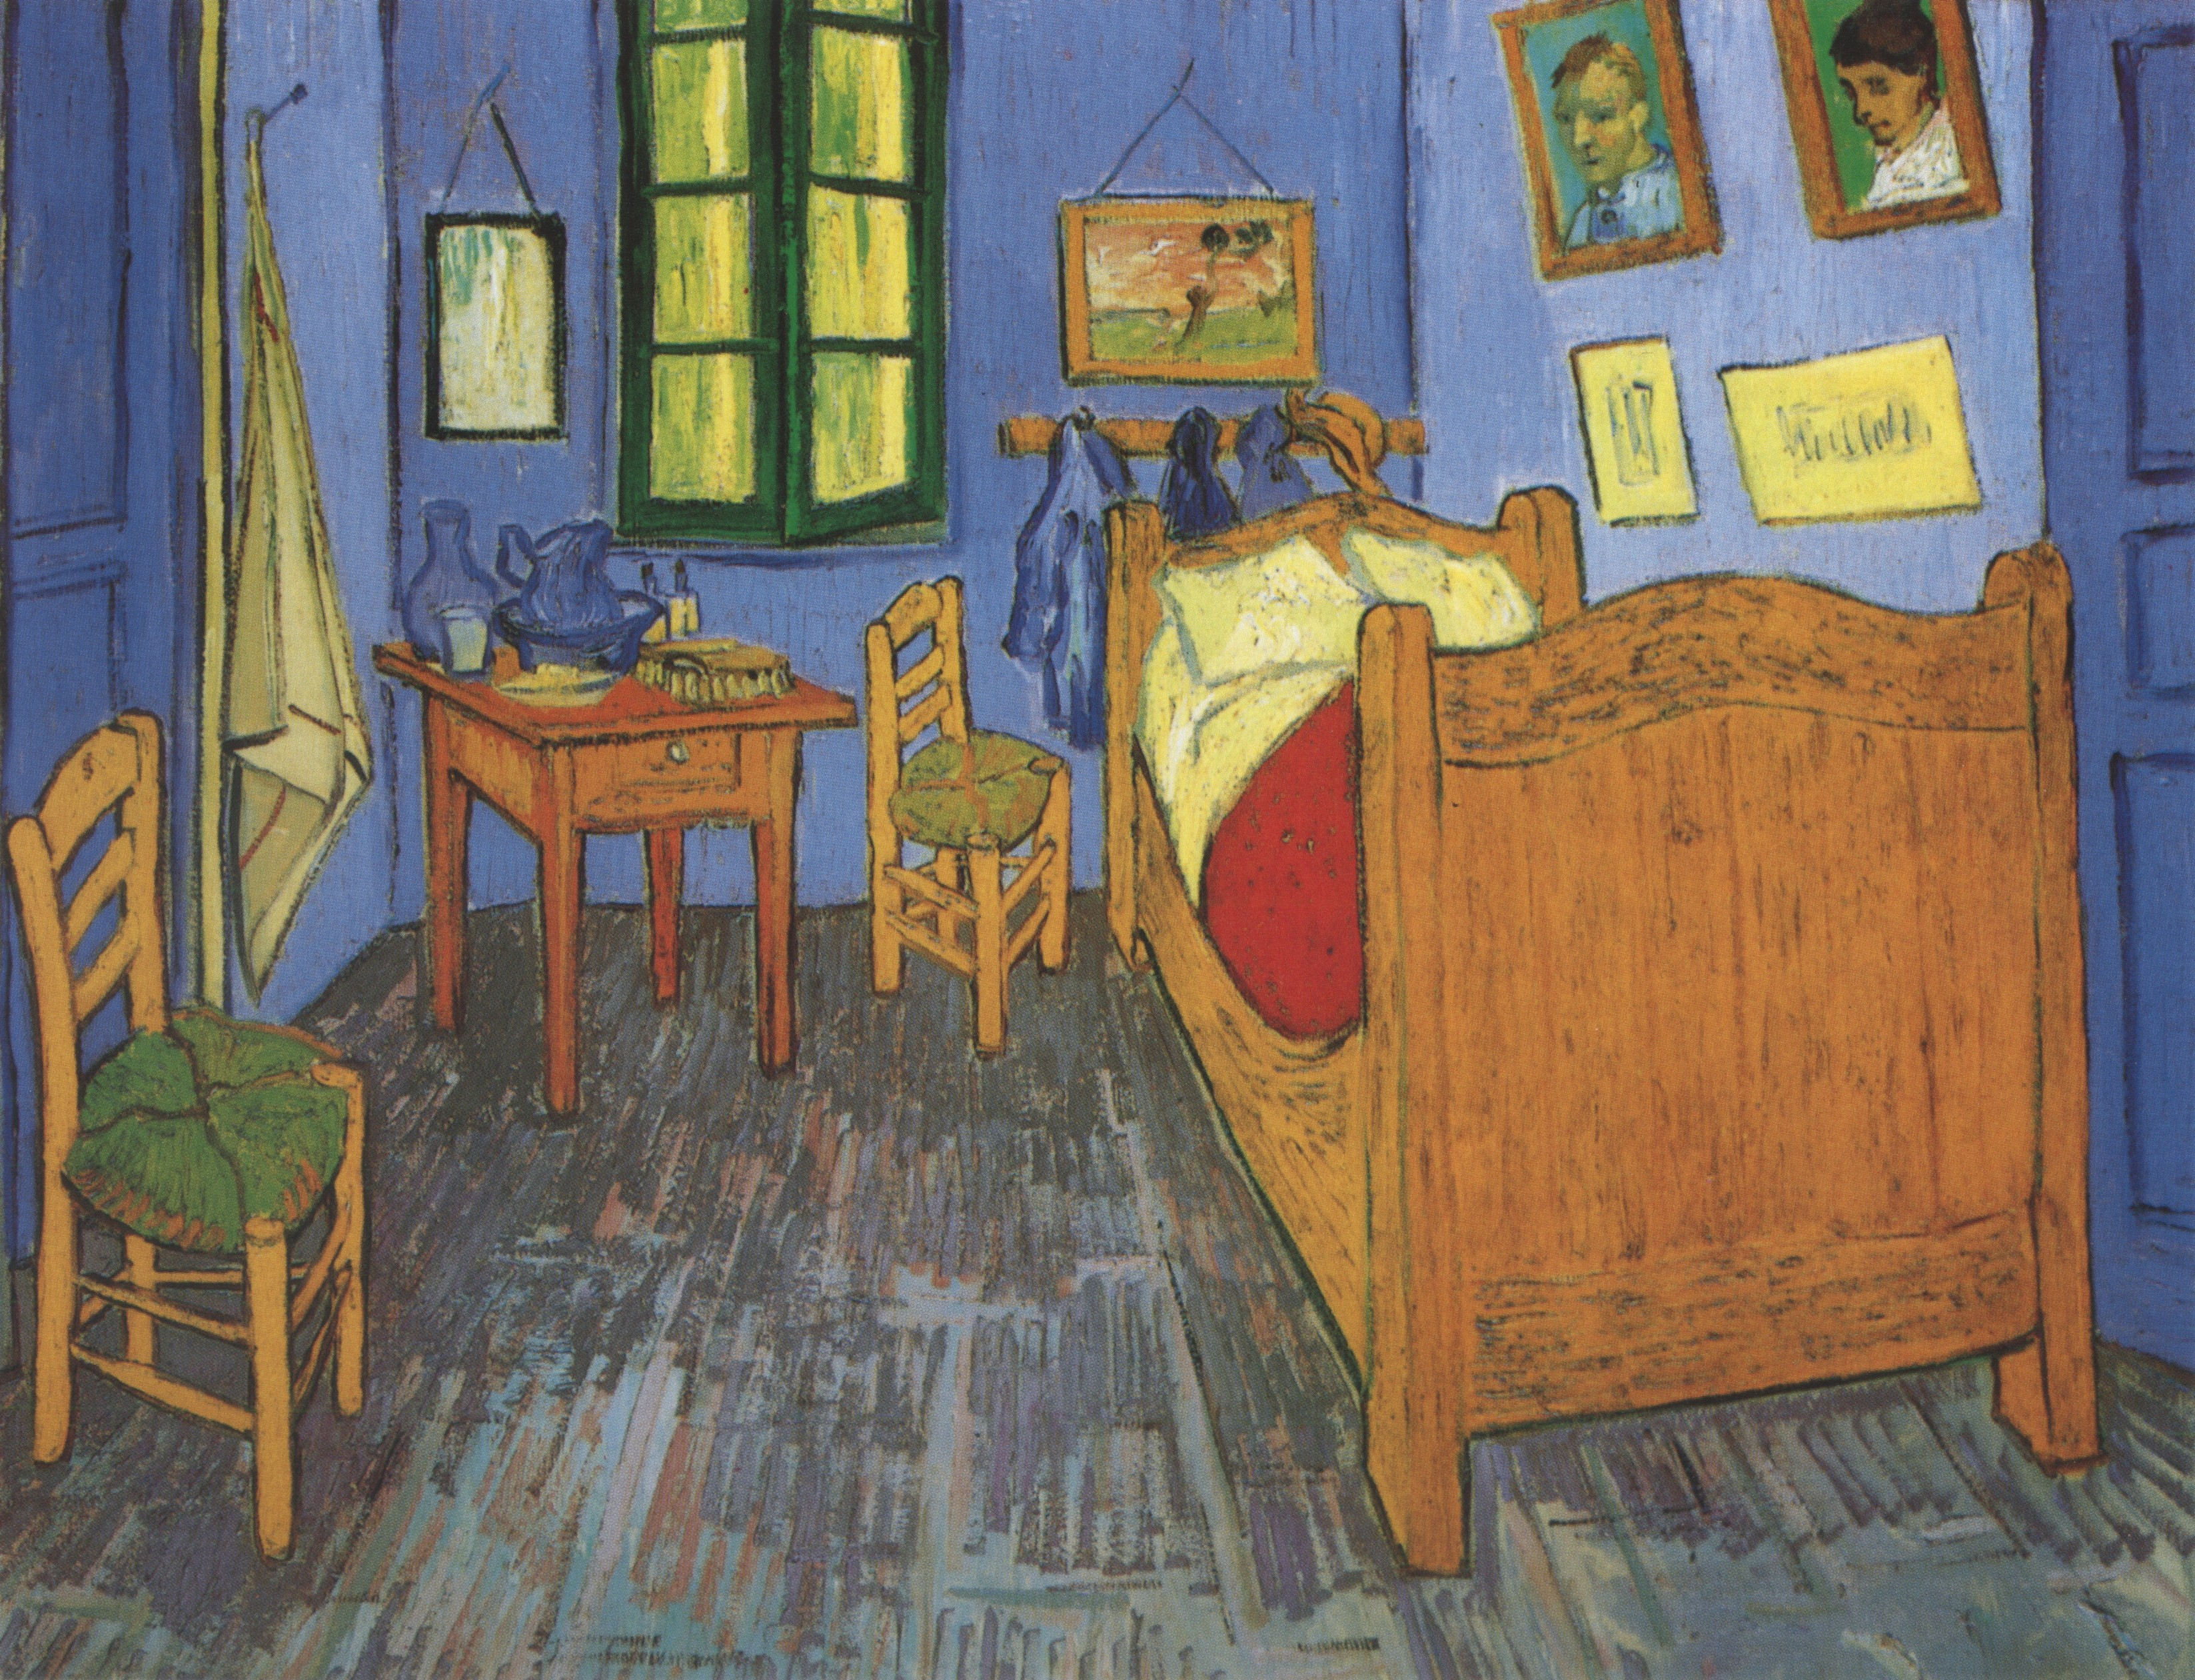 636 The Vincent s Bedroom in Arles Saint Remy 1889 • Image Album